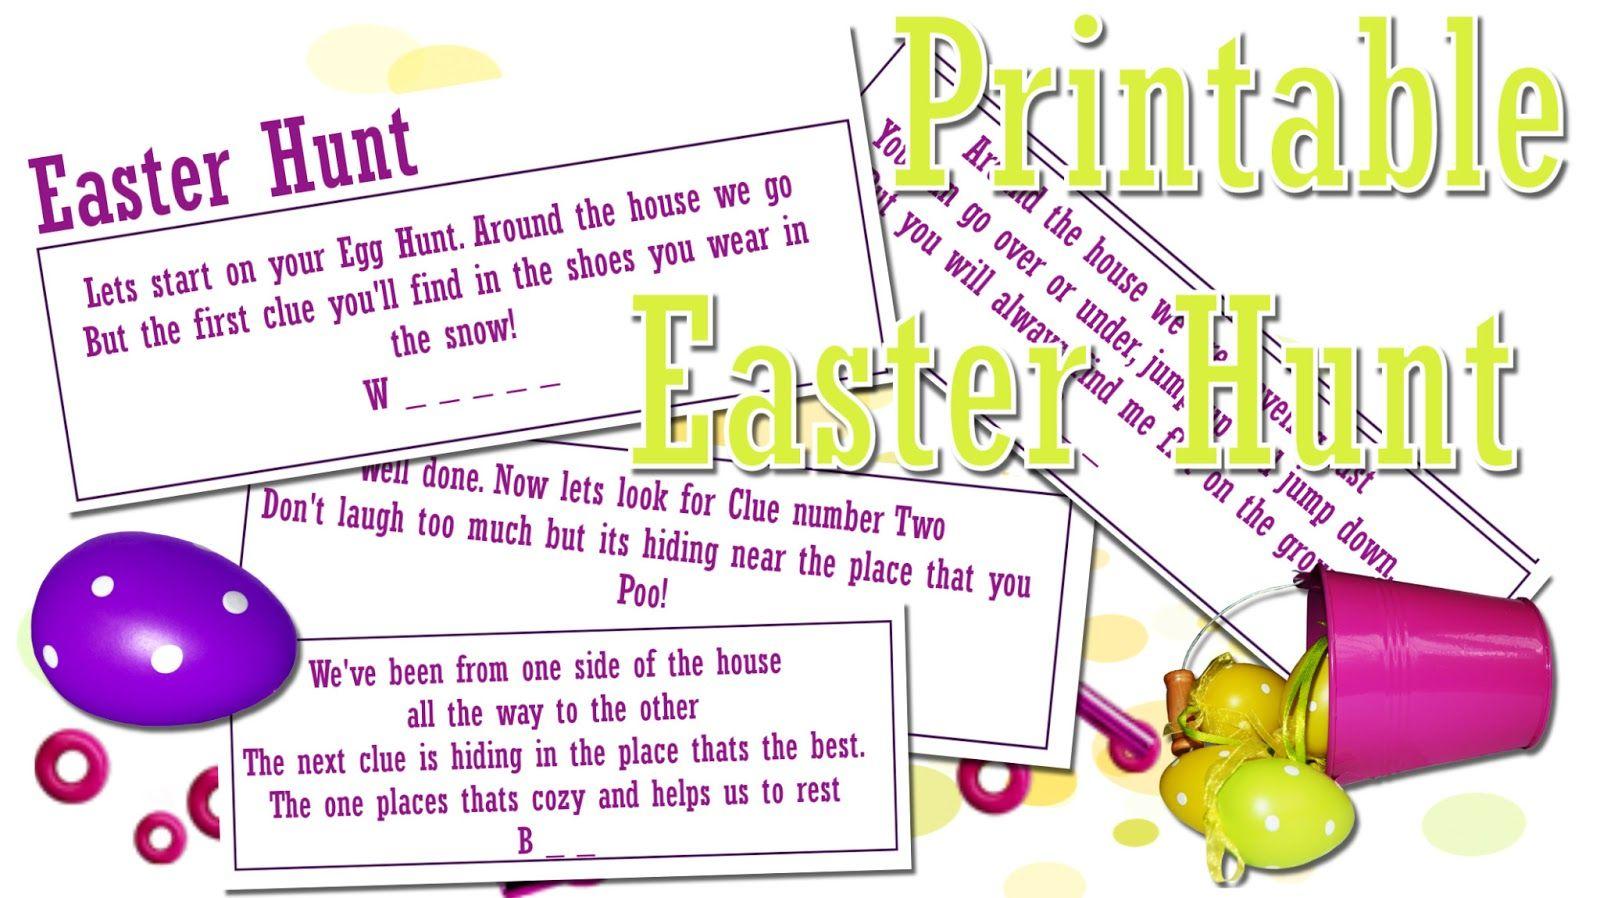 Free Print Out Printable Easter Egg Treasure Hunt Clues